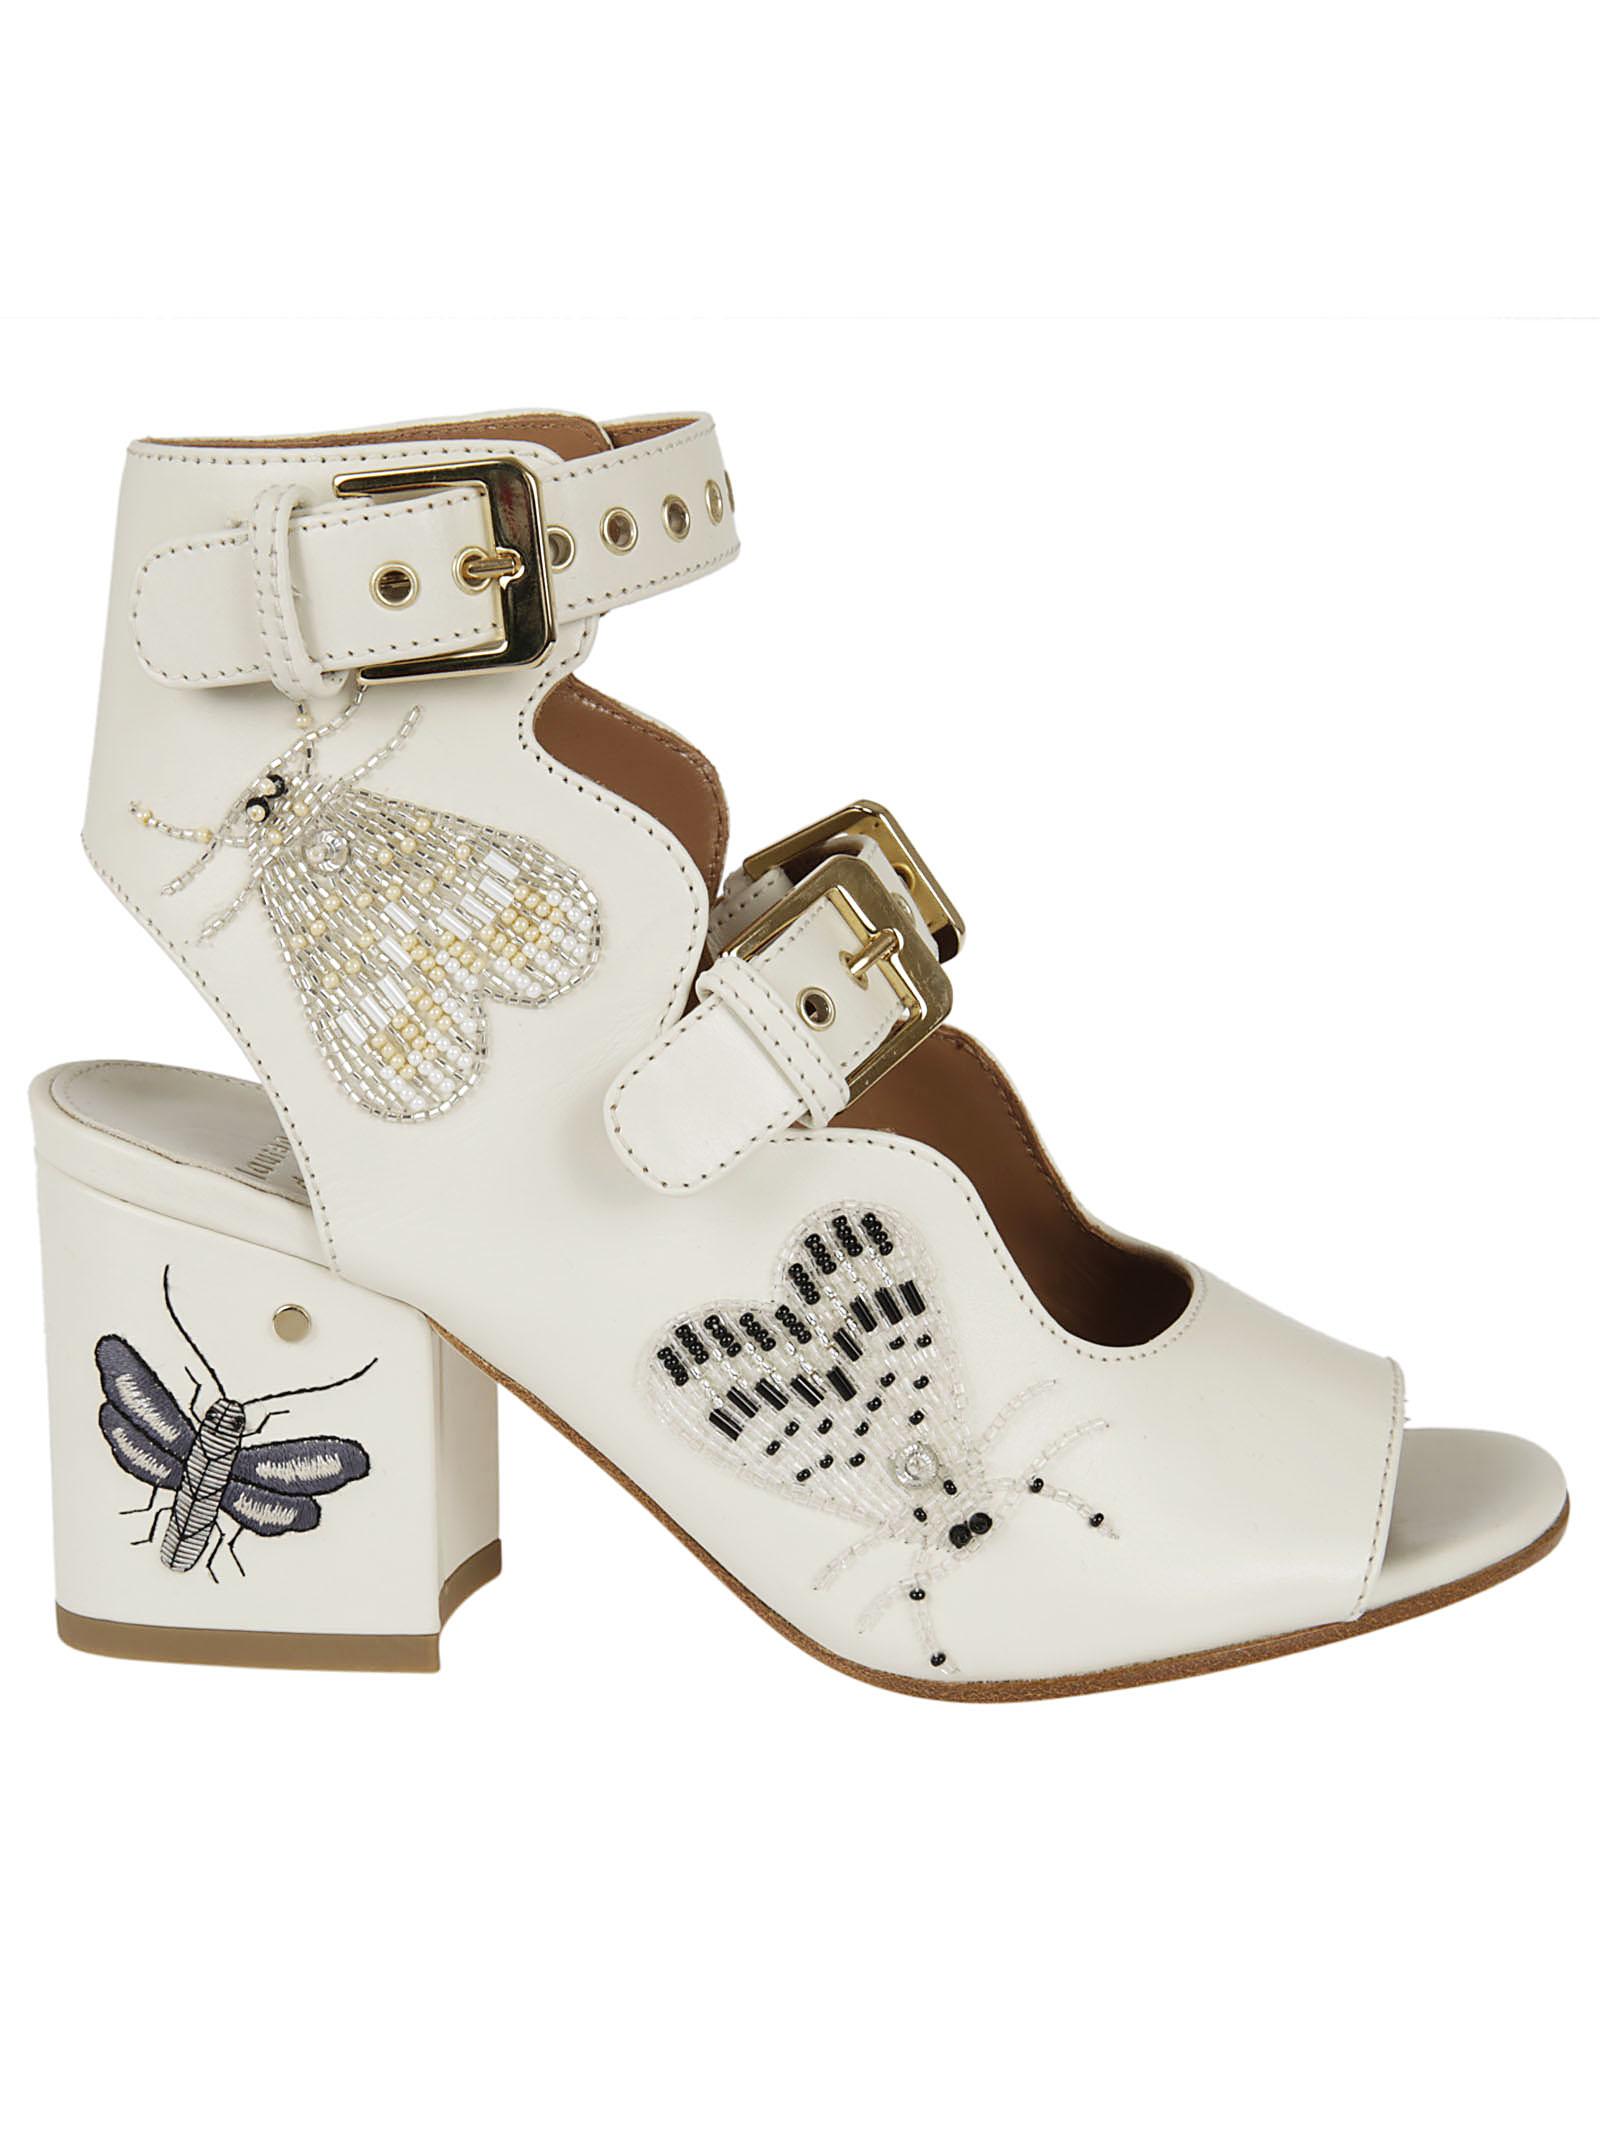 Laurence Dacade Laurence Dacade Noe Buckled Sandals